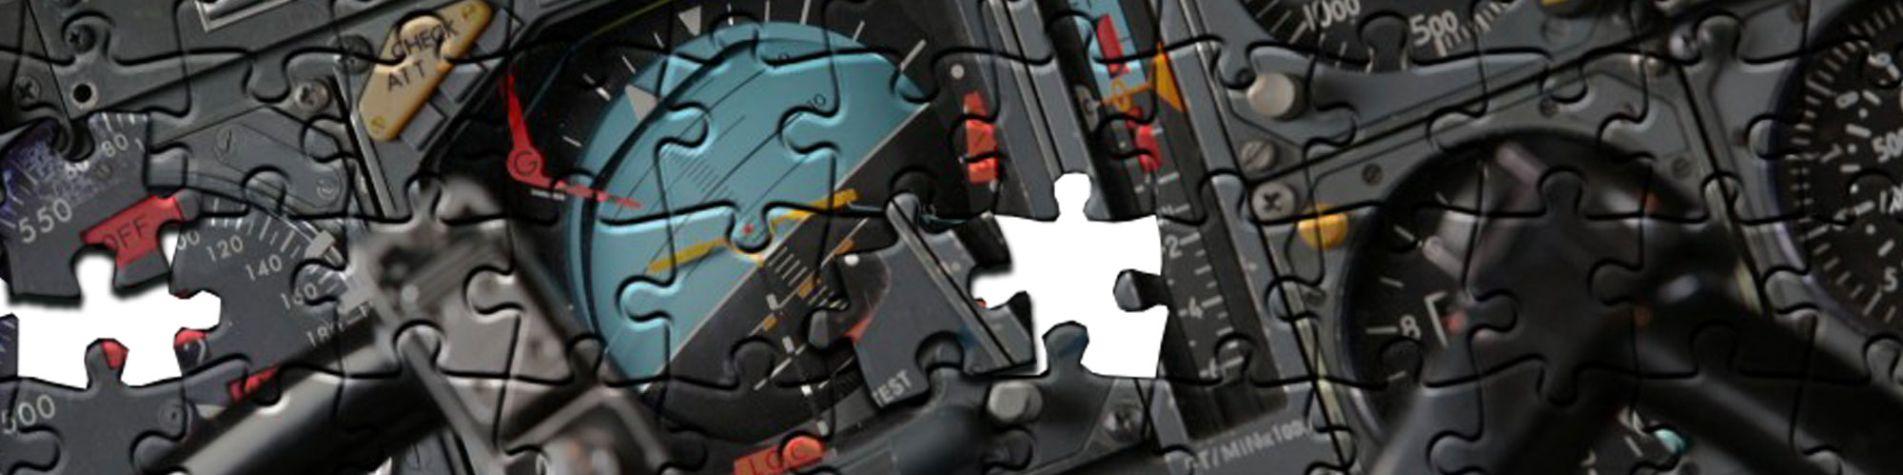 jigsaw-puzzle-header.jpg